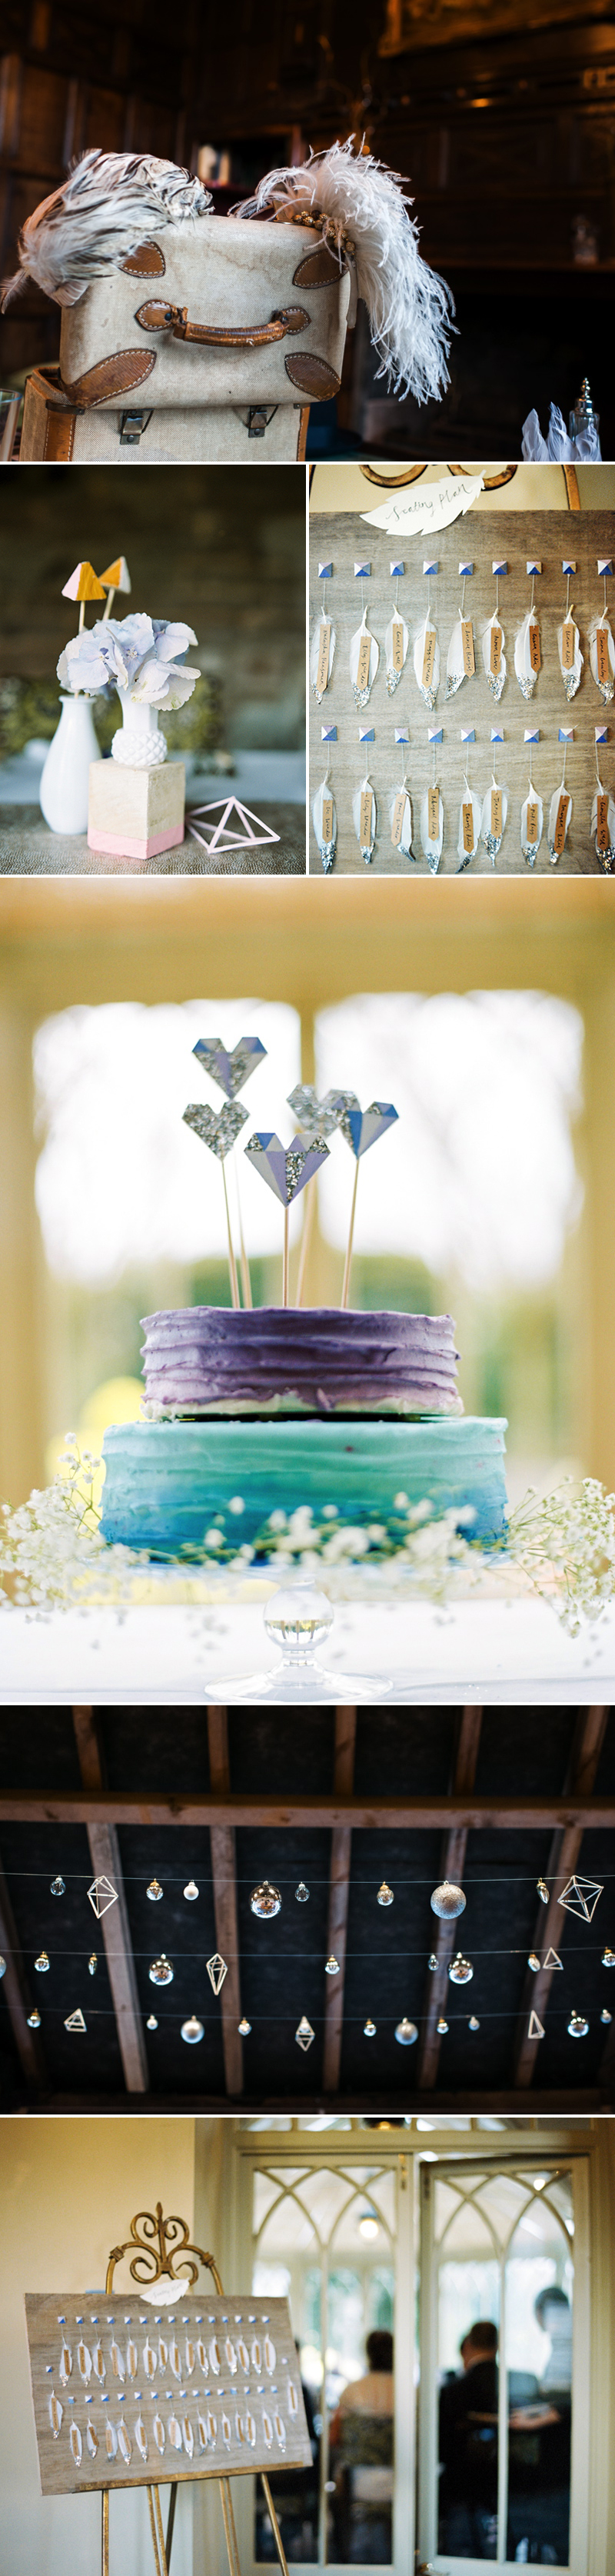 bespoke-wedding-design-and-styling-curious-fair-coco-wedding-venues-ann-kathrin-koch